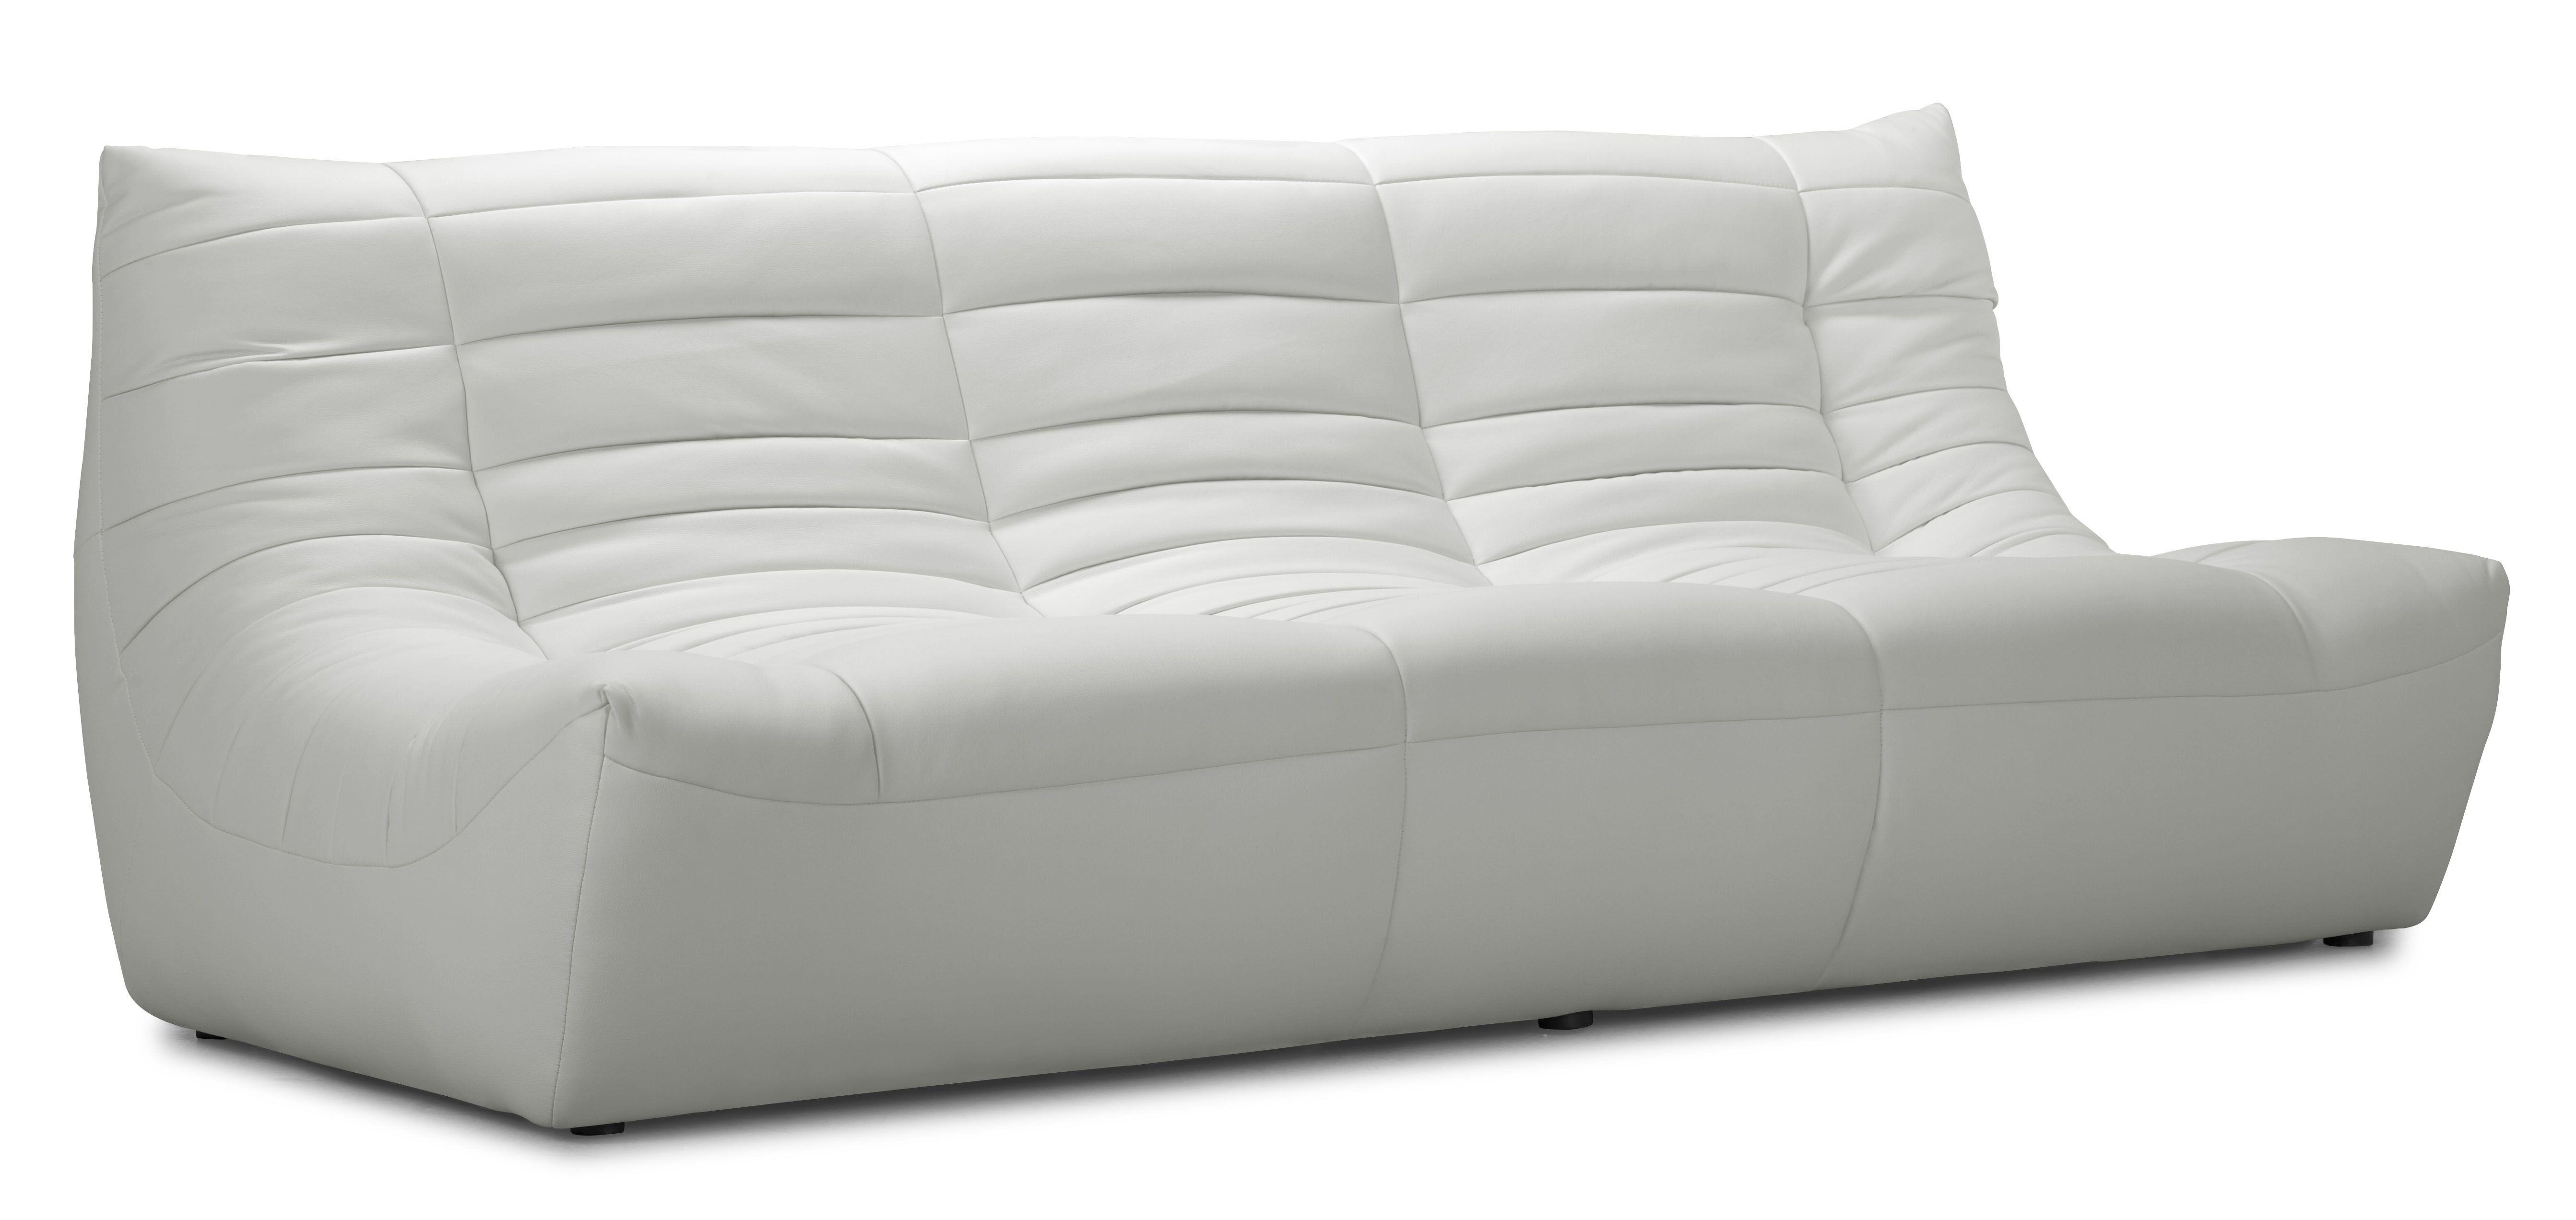 Admirable Carnival Sofa White Living Room White Sofas Sofa Black Ibusinesslaw Wood Chair Design Ideas Ibusinesslaworg